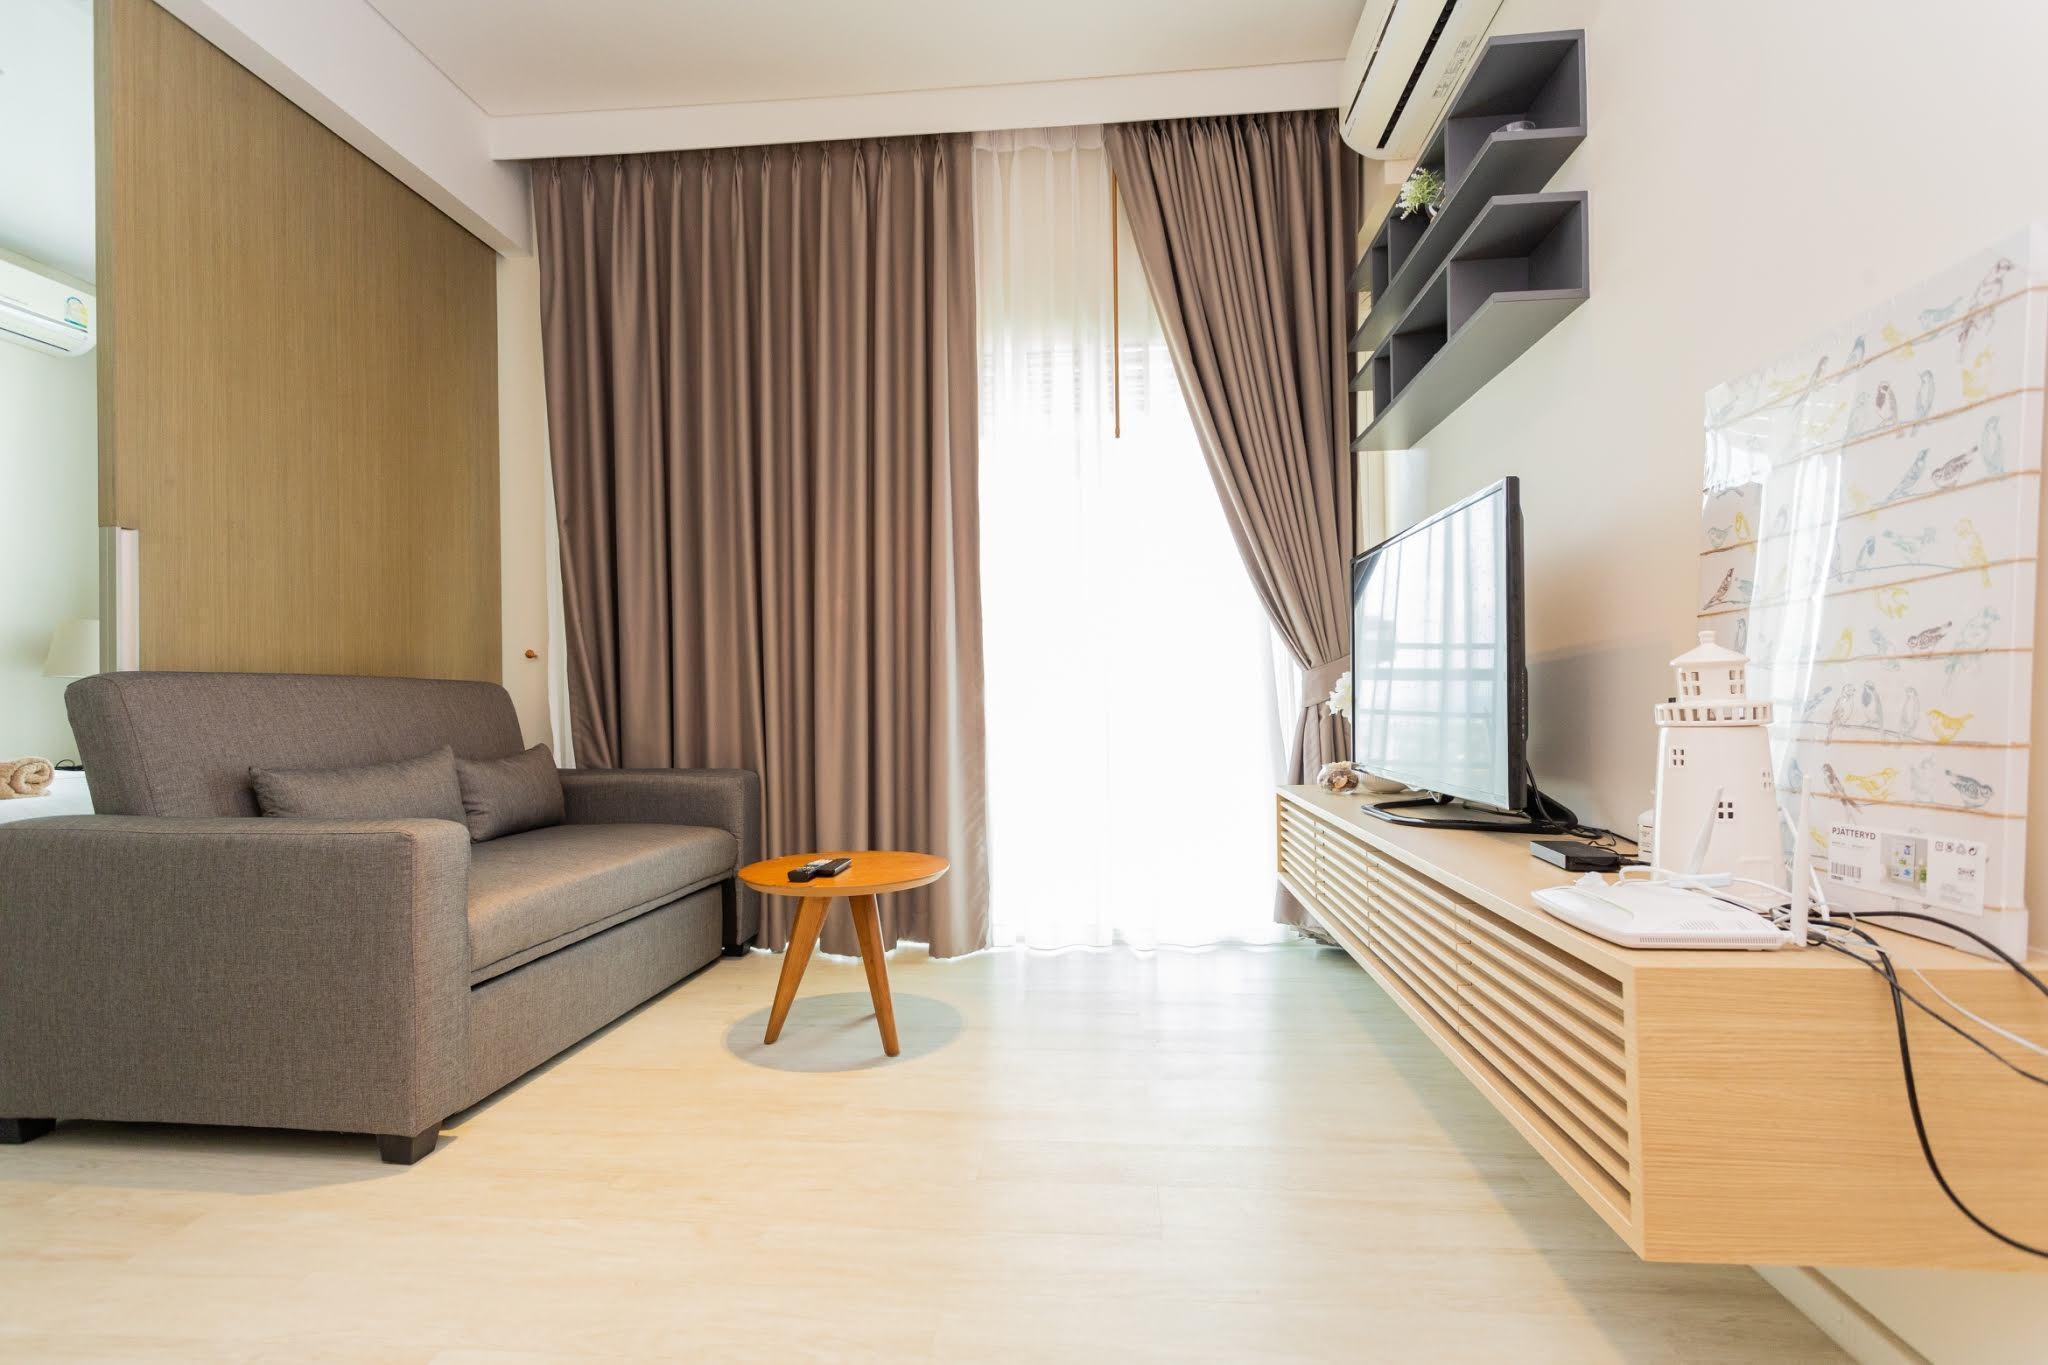 Luxurious 1 Bedroom In Veranda Residence Jomtien Luxurious 1 Bedroom In Veranda Residence Jomtien